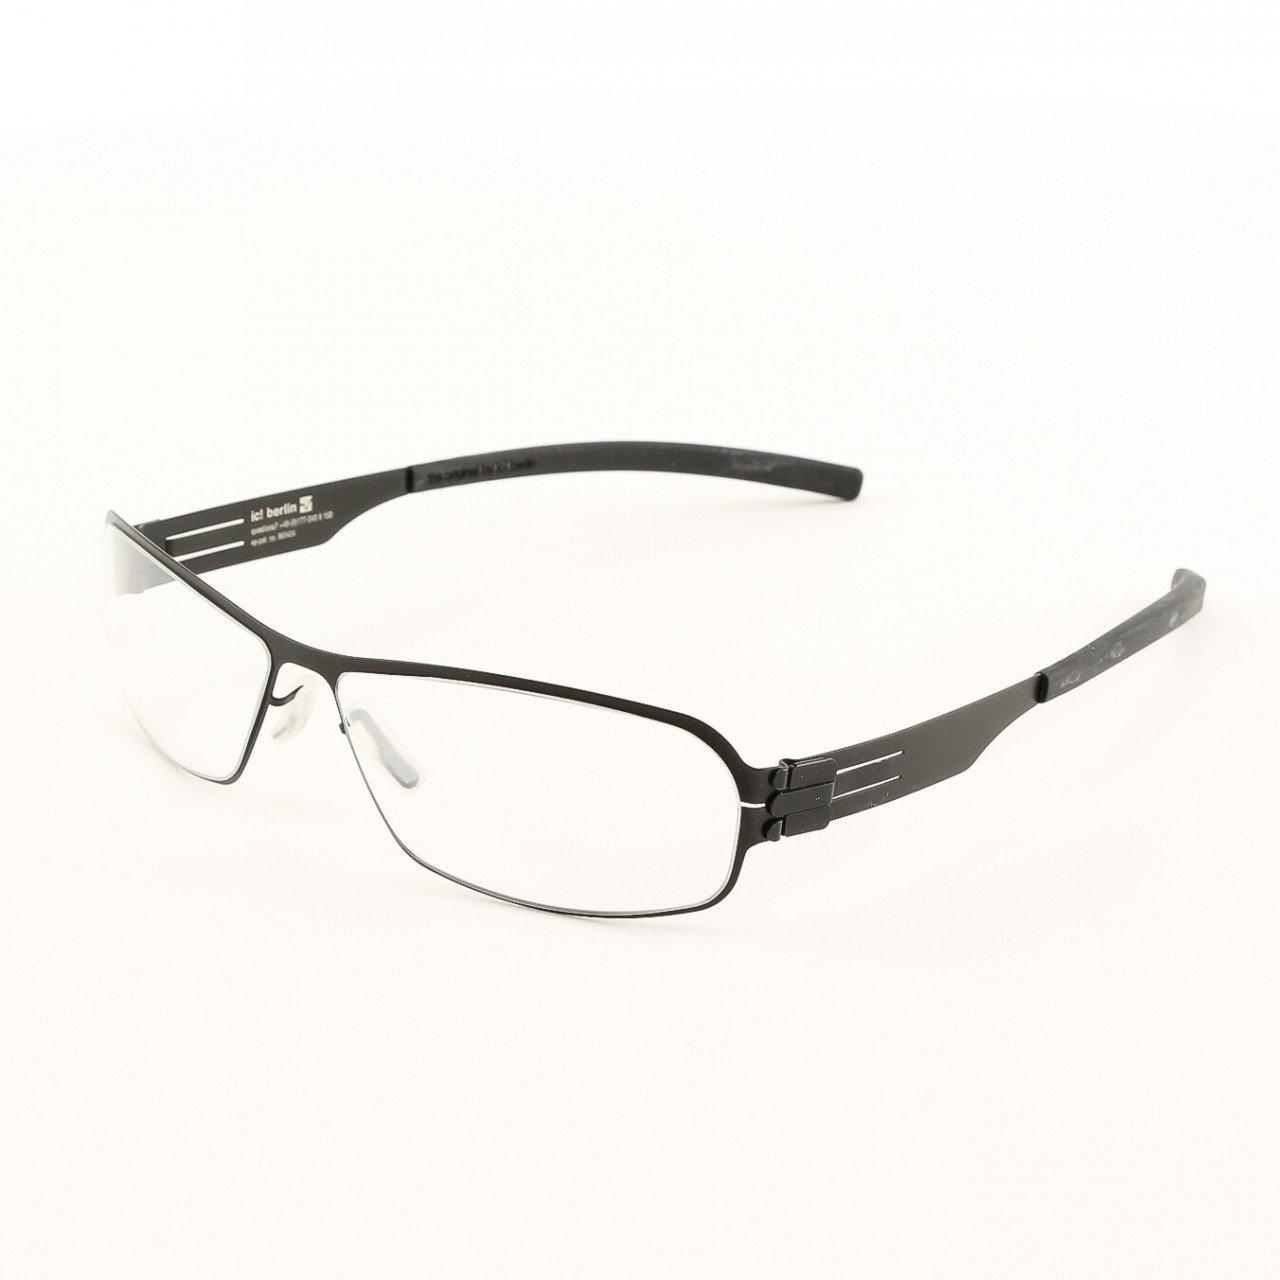 ic! Berlin Ye G. Eyeglasses Col. Black with Clear Lenses